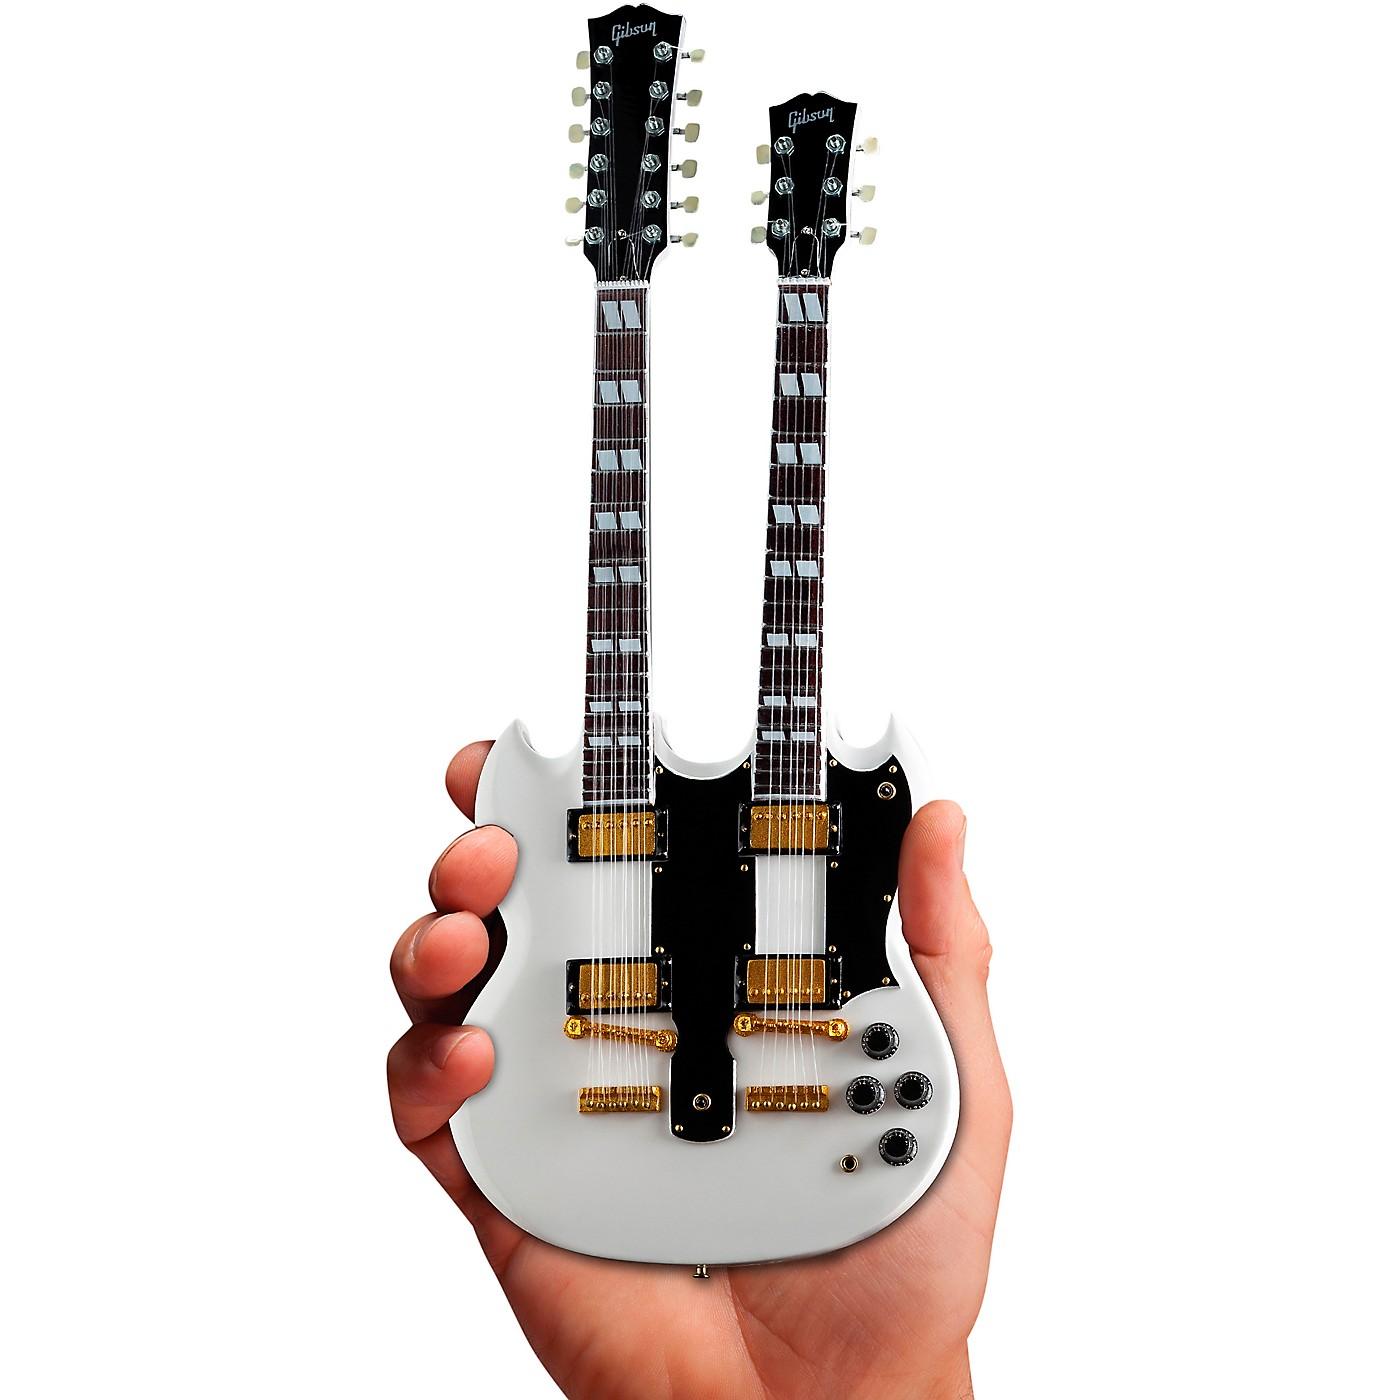 Axe Heaven Gibson SG EDS-1275 Doubleneck White Officially Licensed Miniature Guitar Replica thumbnail